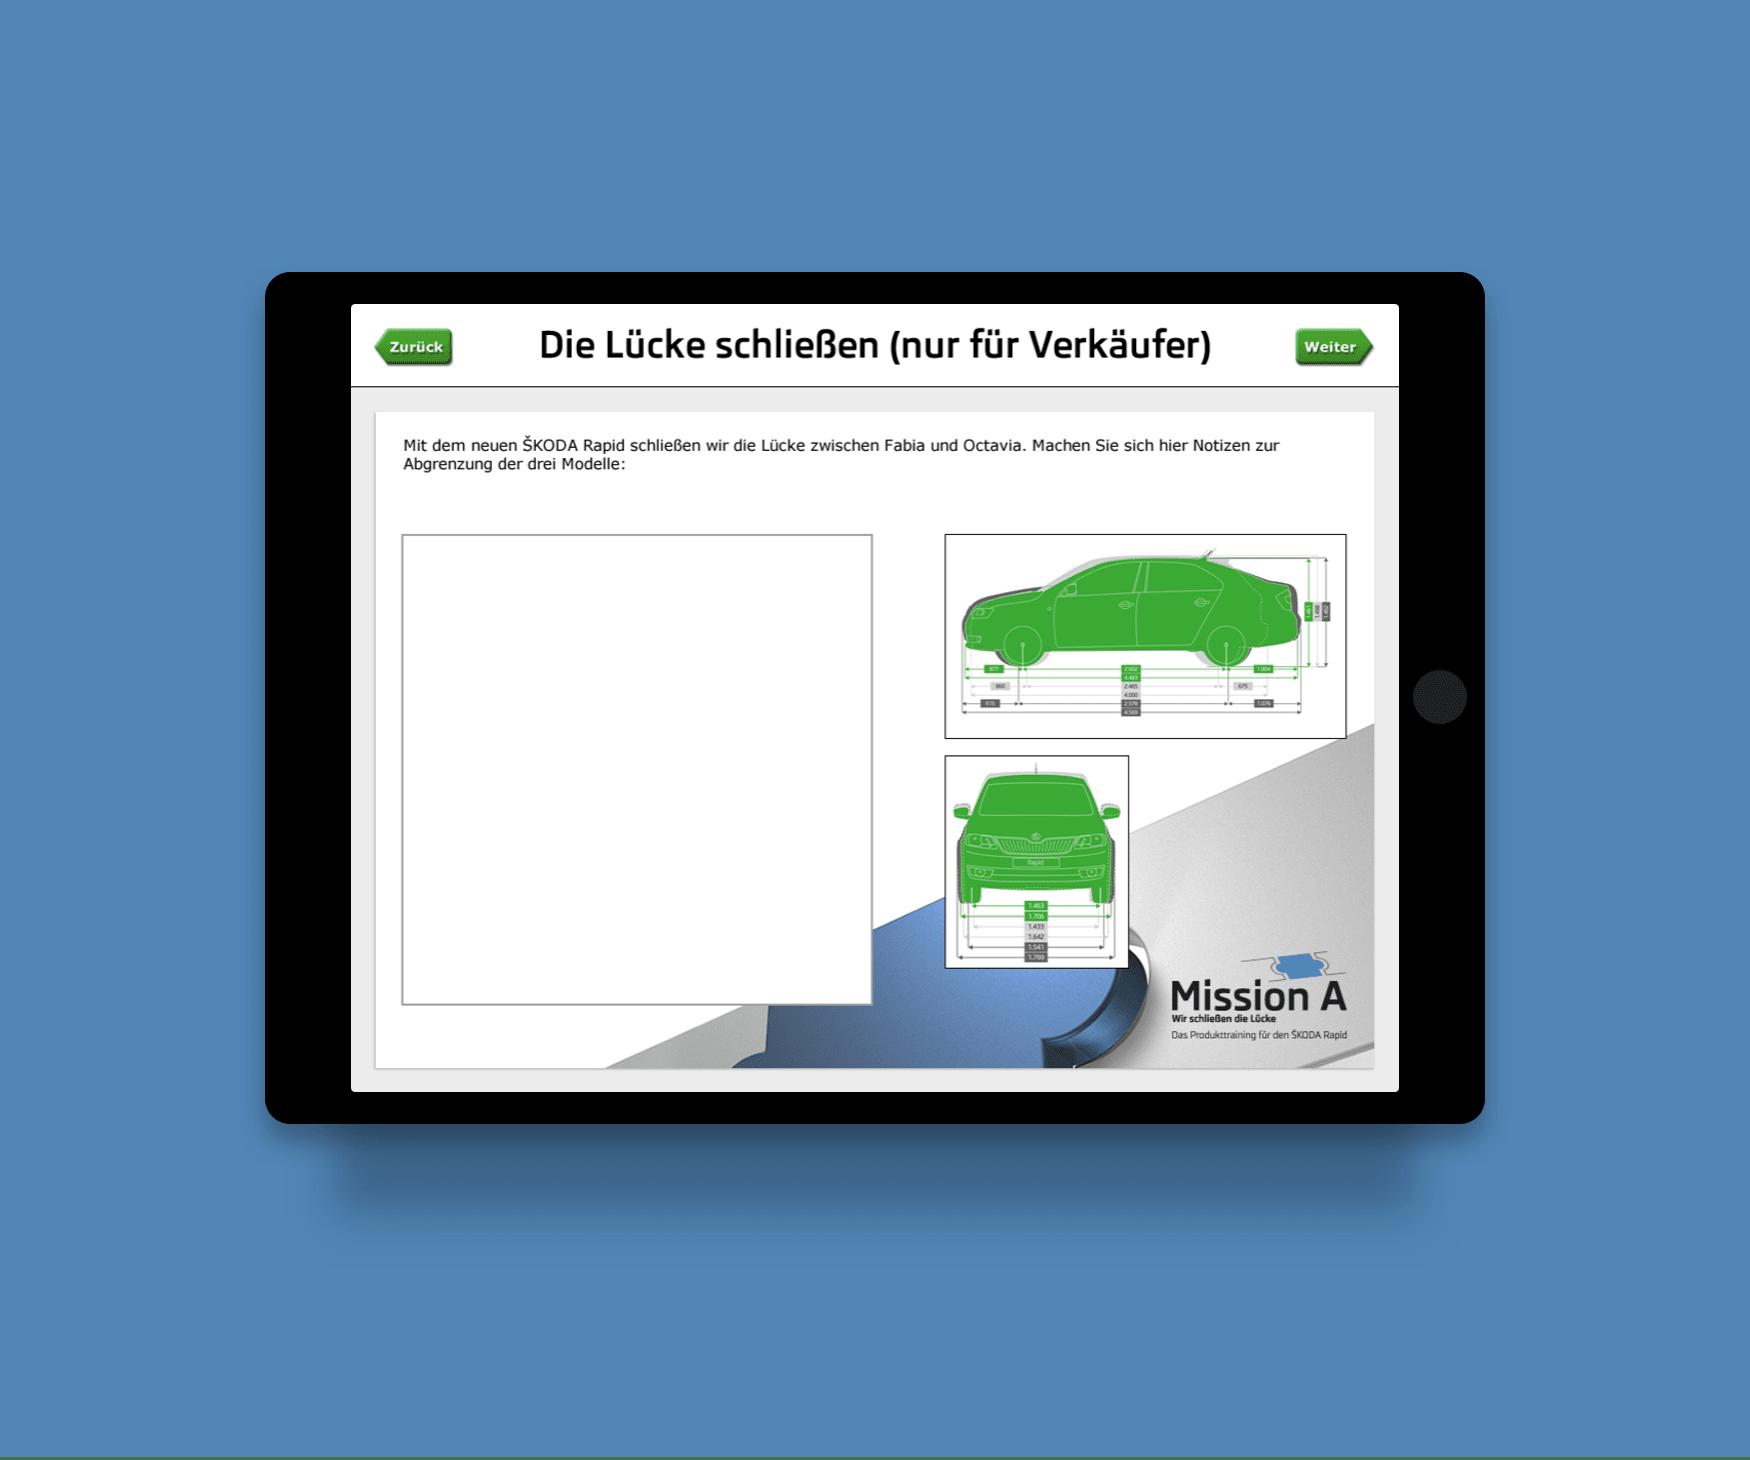 Skoda-iPad-App-Development-004-mobile